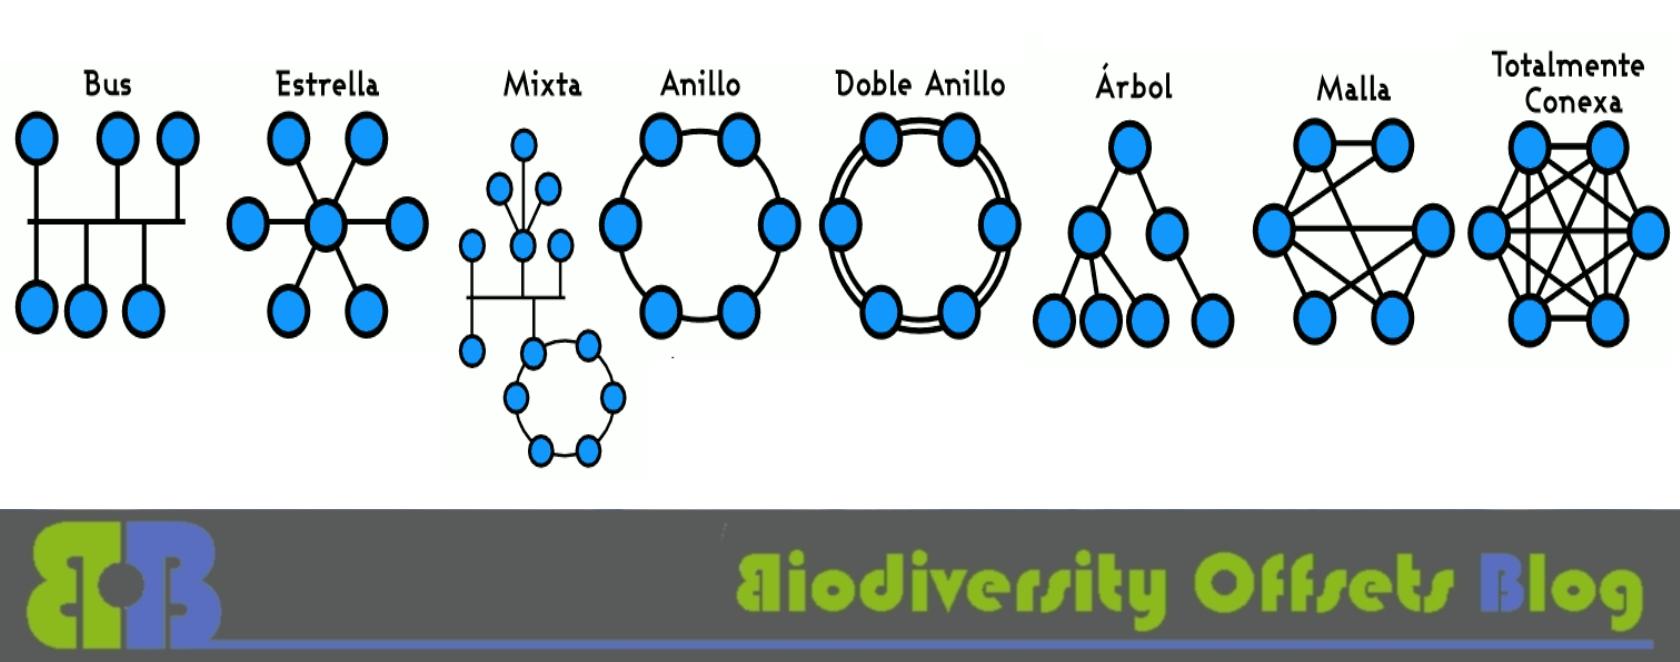 Biodiversity Offsets Blog Logo_hellgruen_network_1680